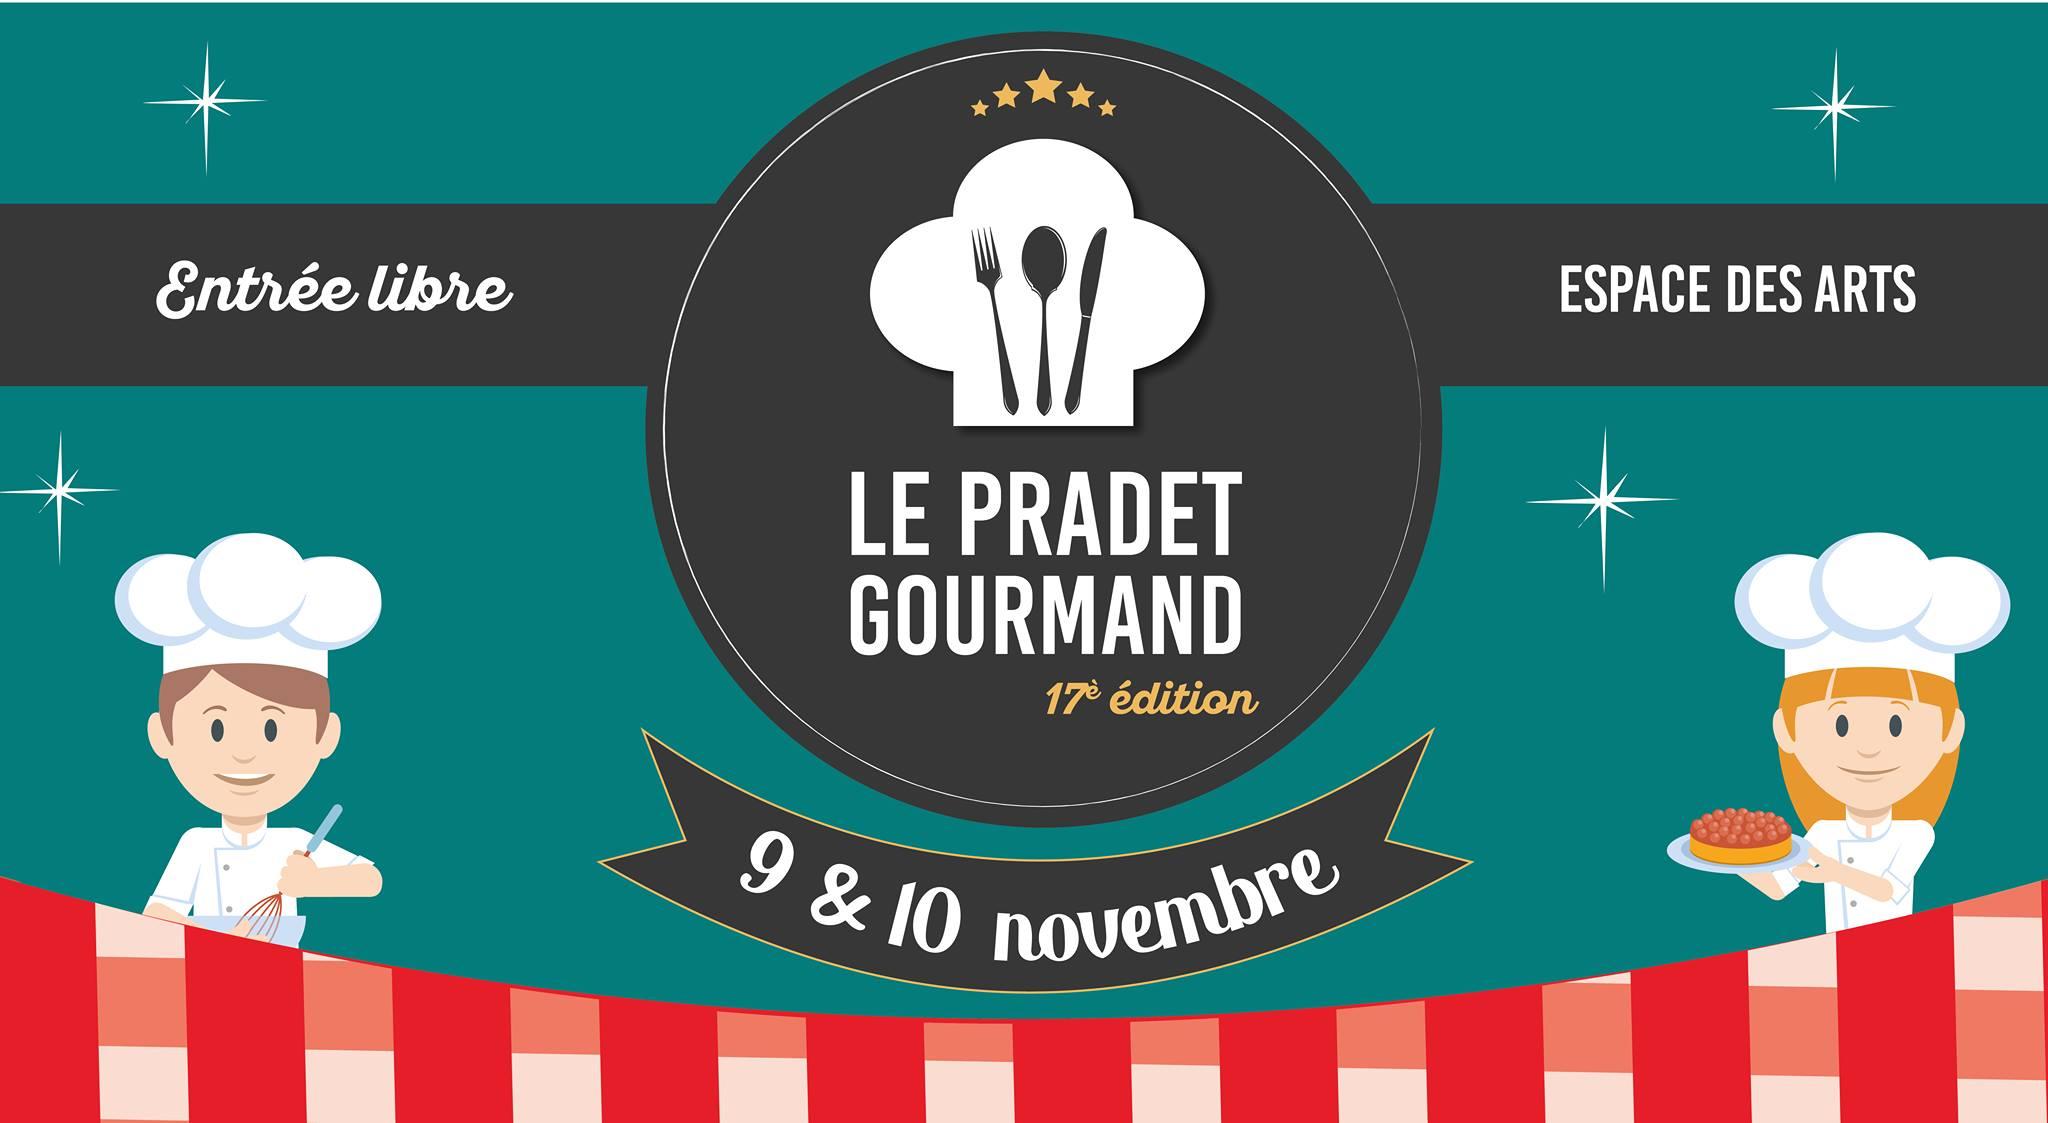 Le Pradet Gourmand 2019